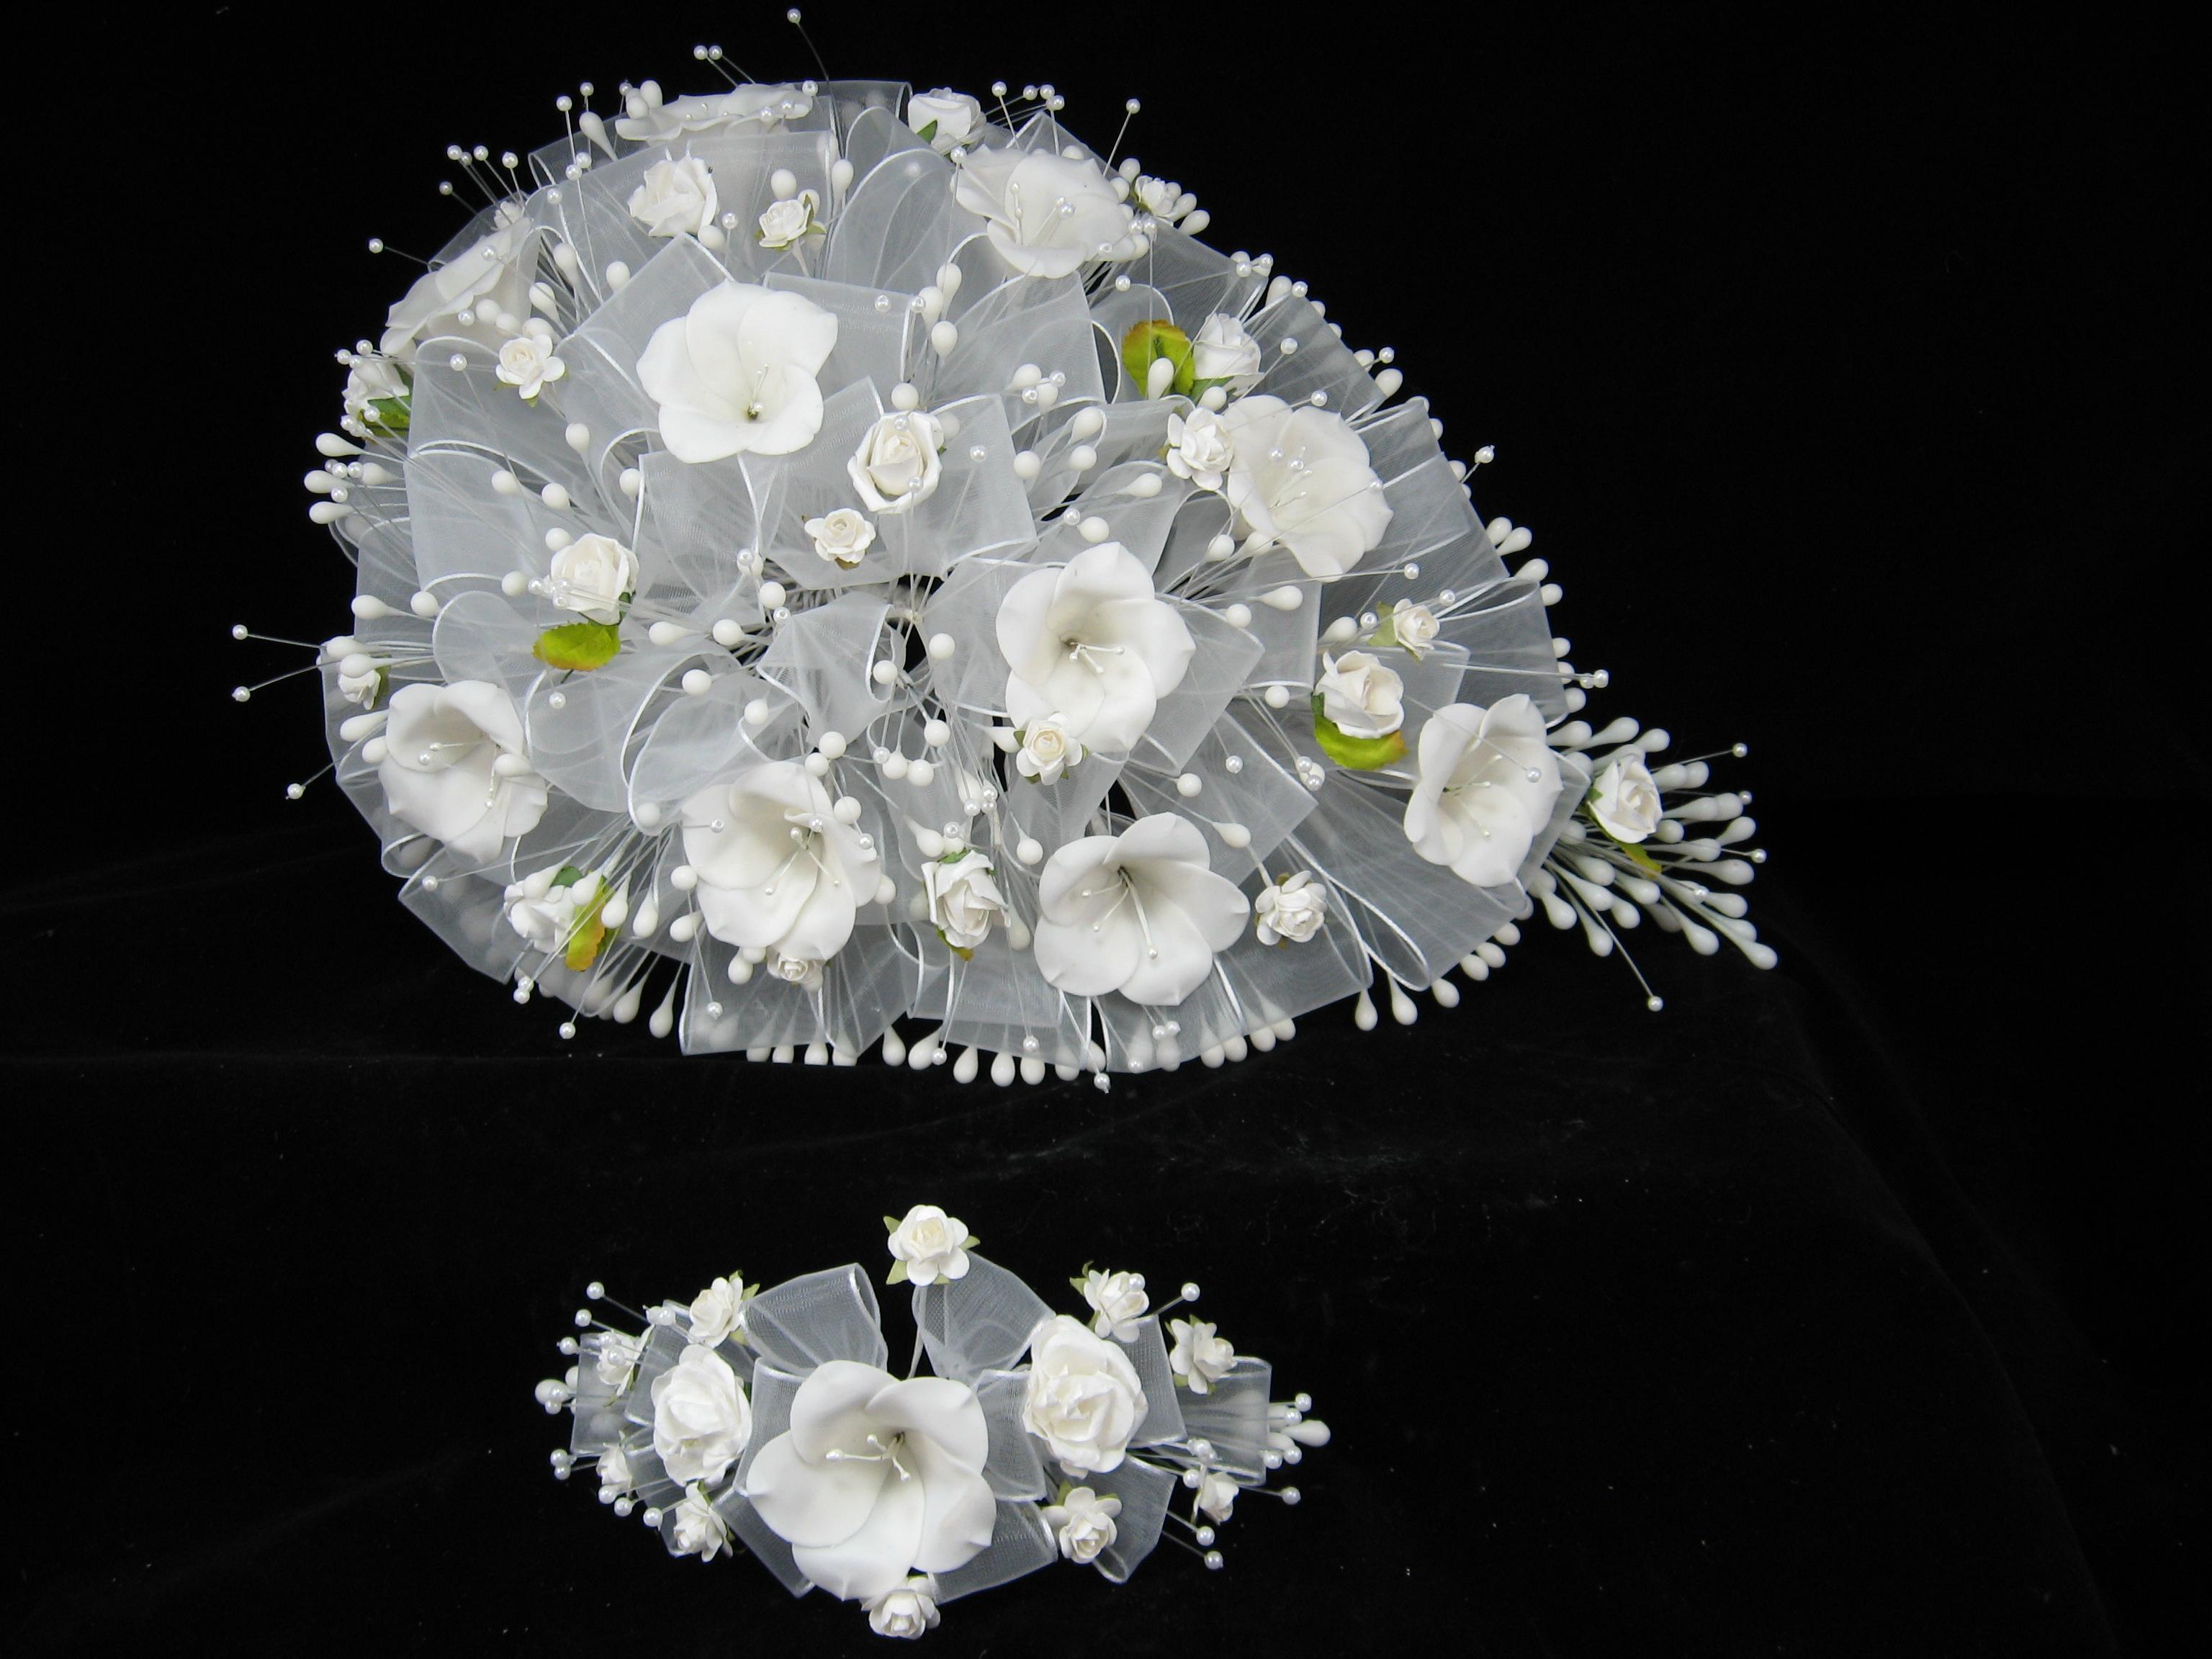 Flores de migajon car interior design - Como hacer ramos de flores ...